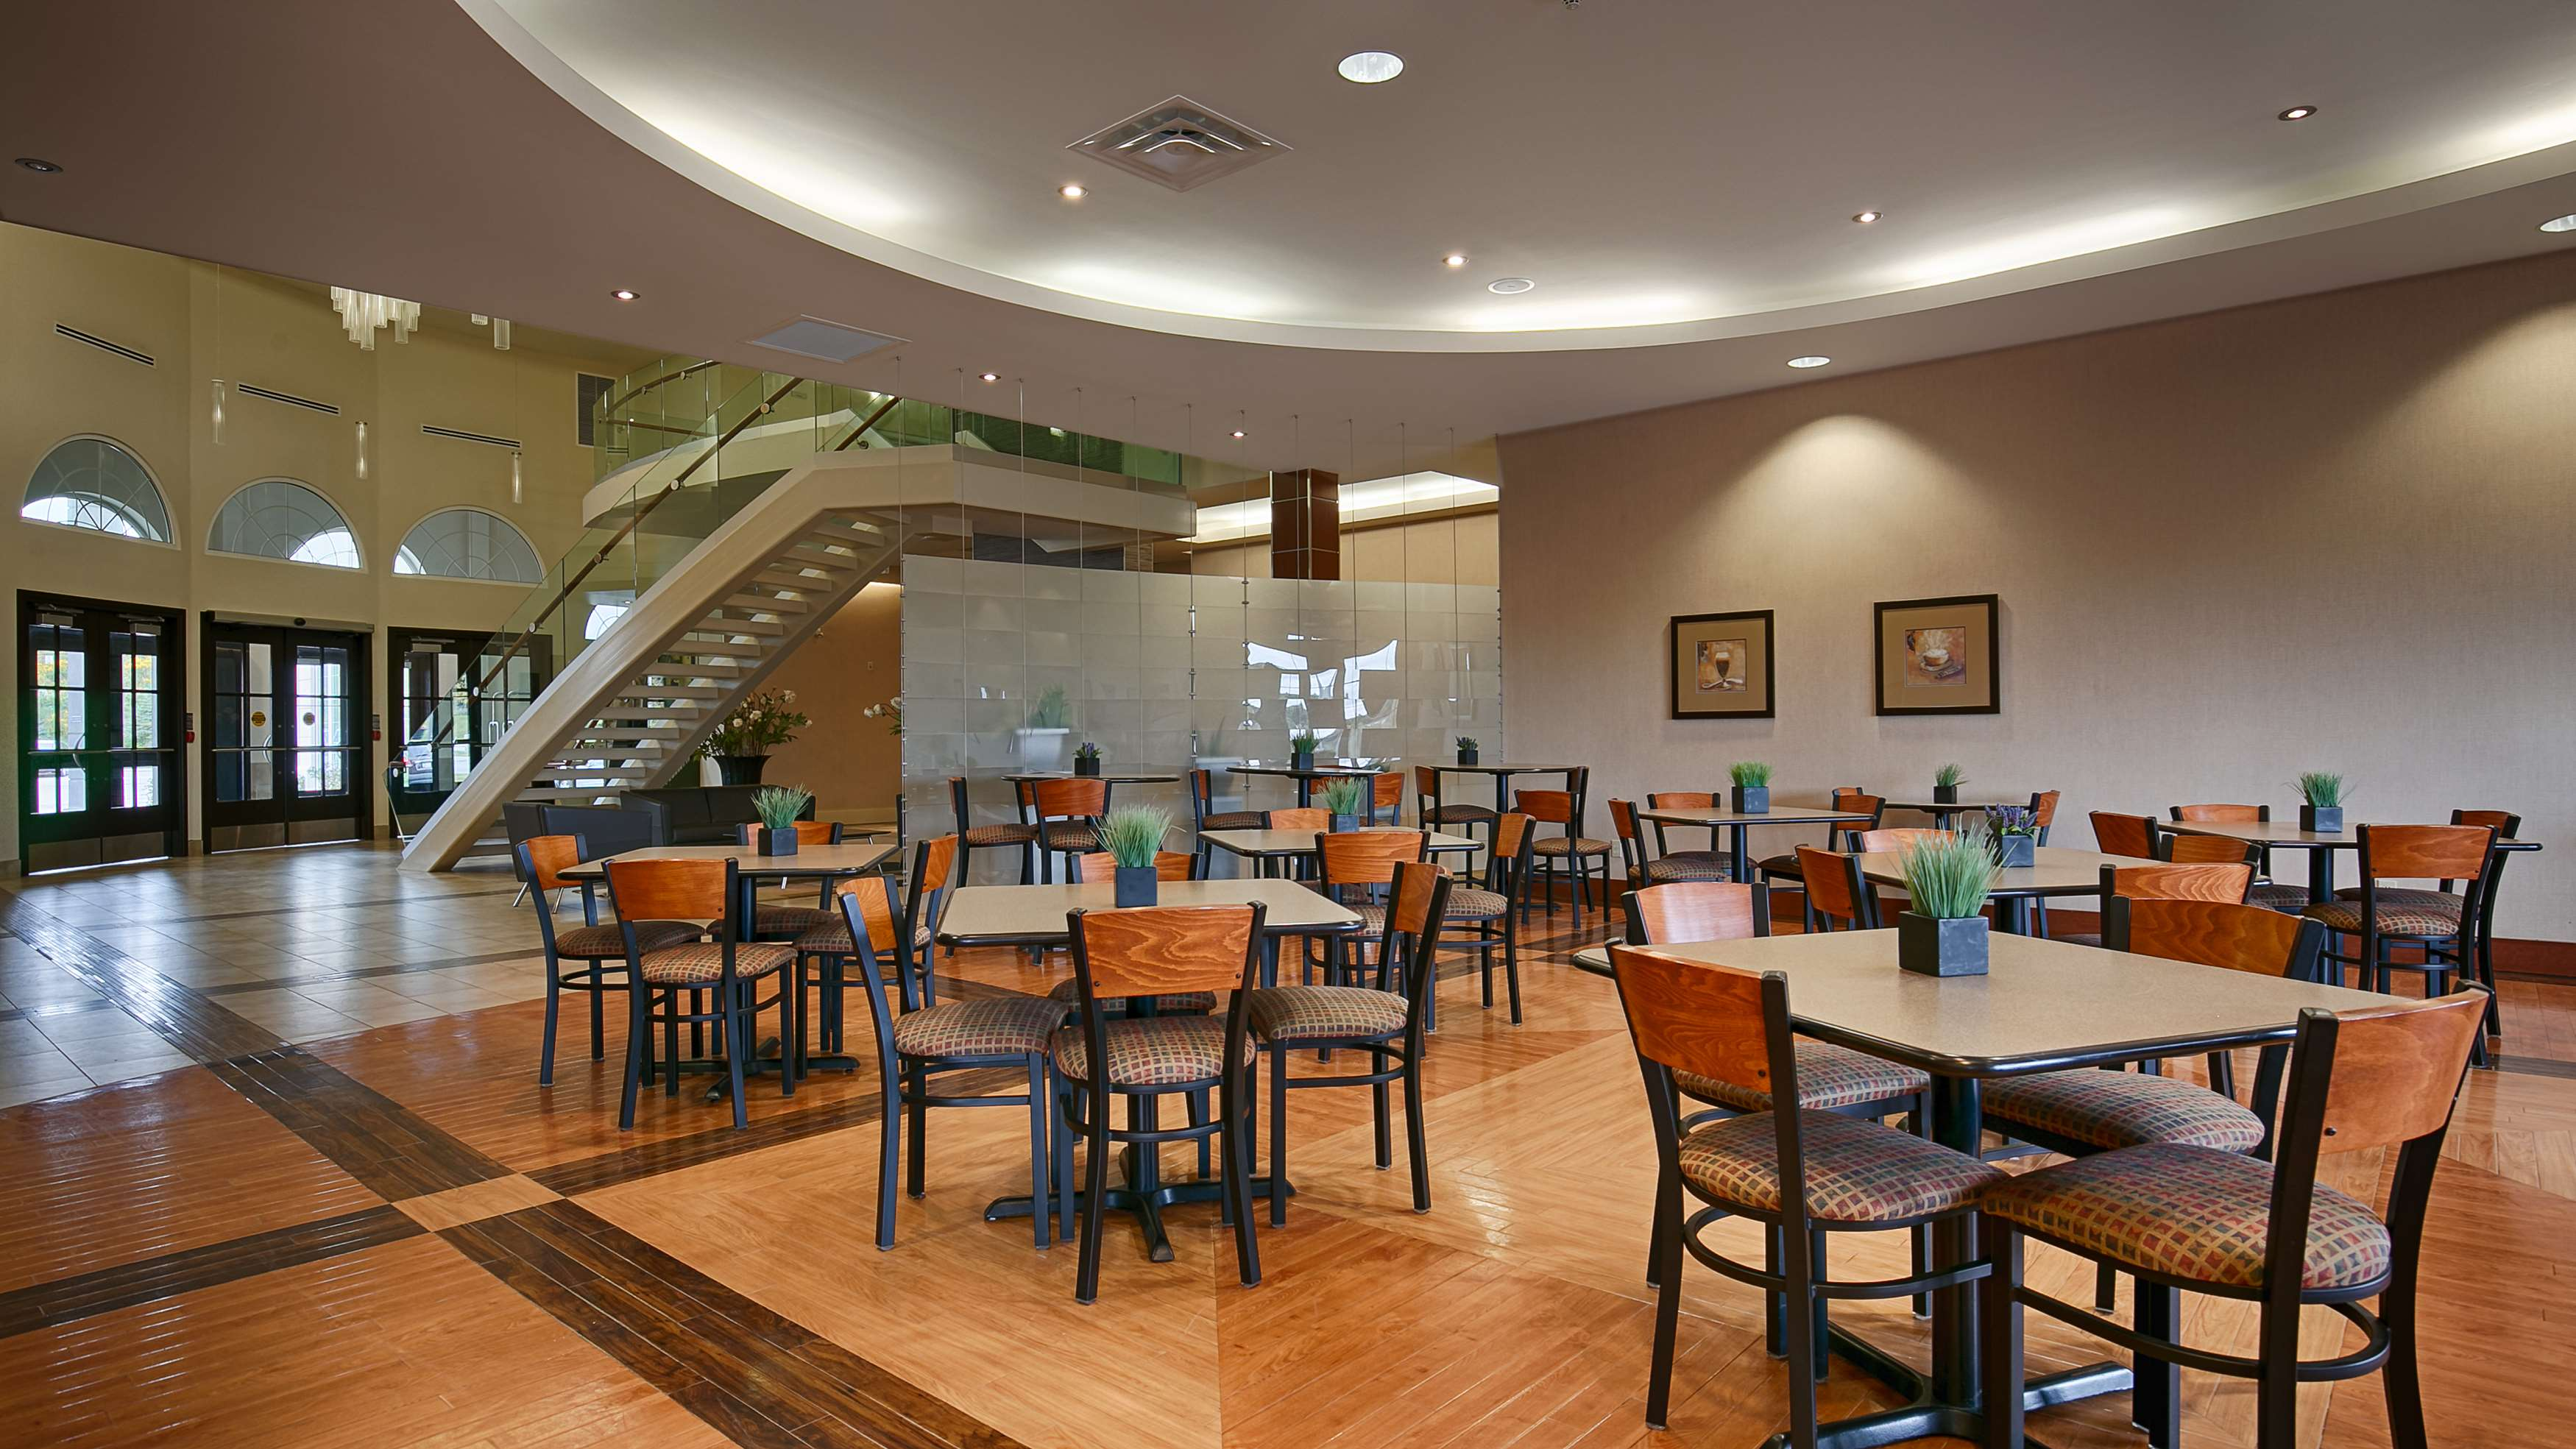 Breakfast Area Best Western Plus Orangeville Inn & Suites Orangeville (519)941-3311